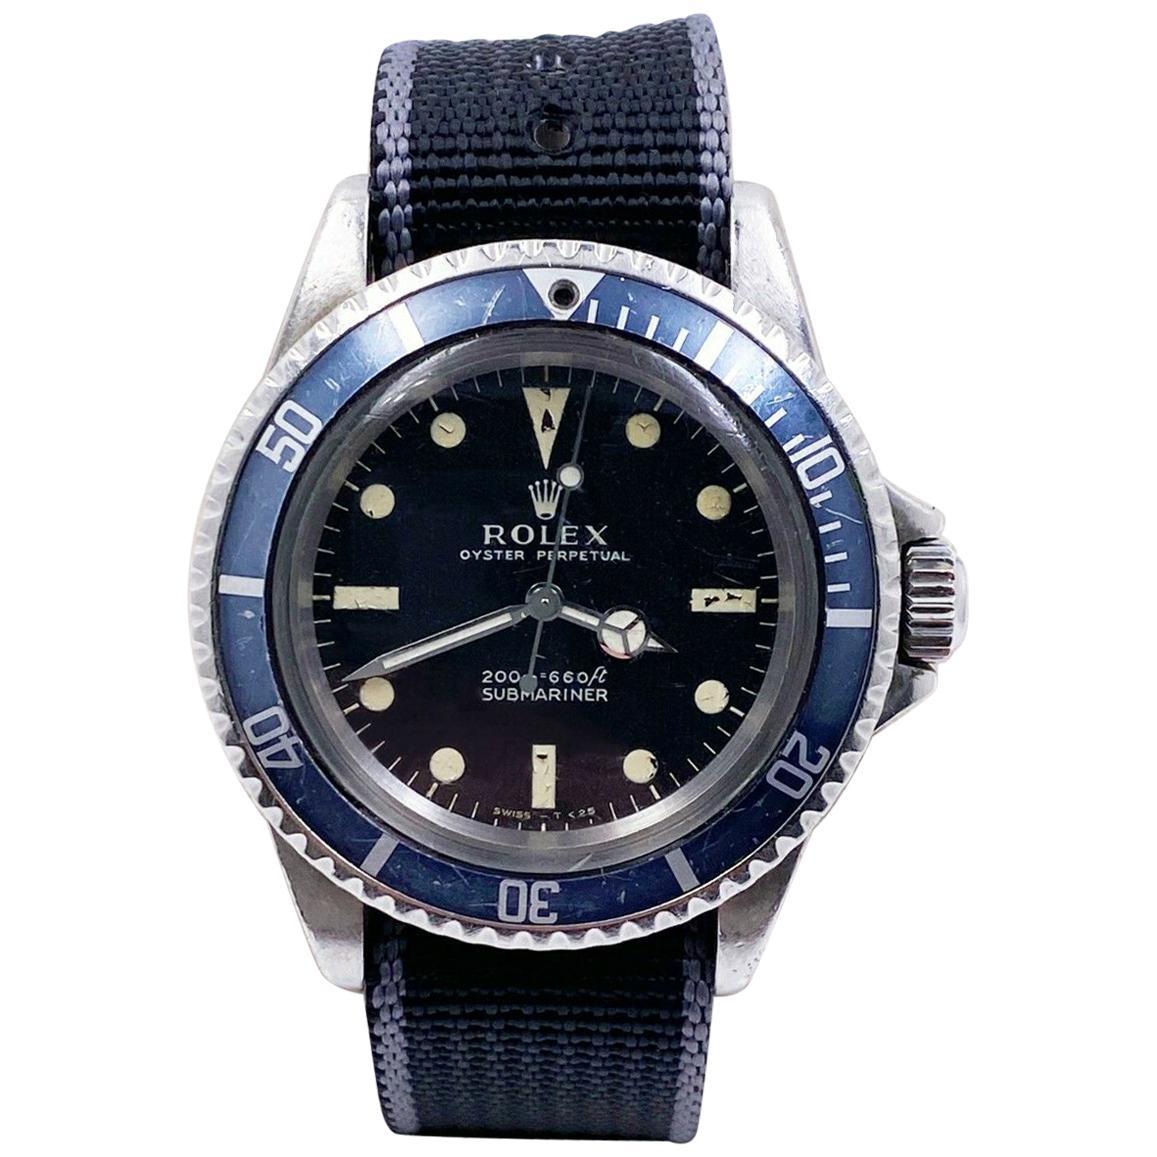 Vintage Rolex Submariner 5513 Black Matte Dial Stainless Steel, 1969